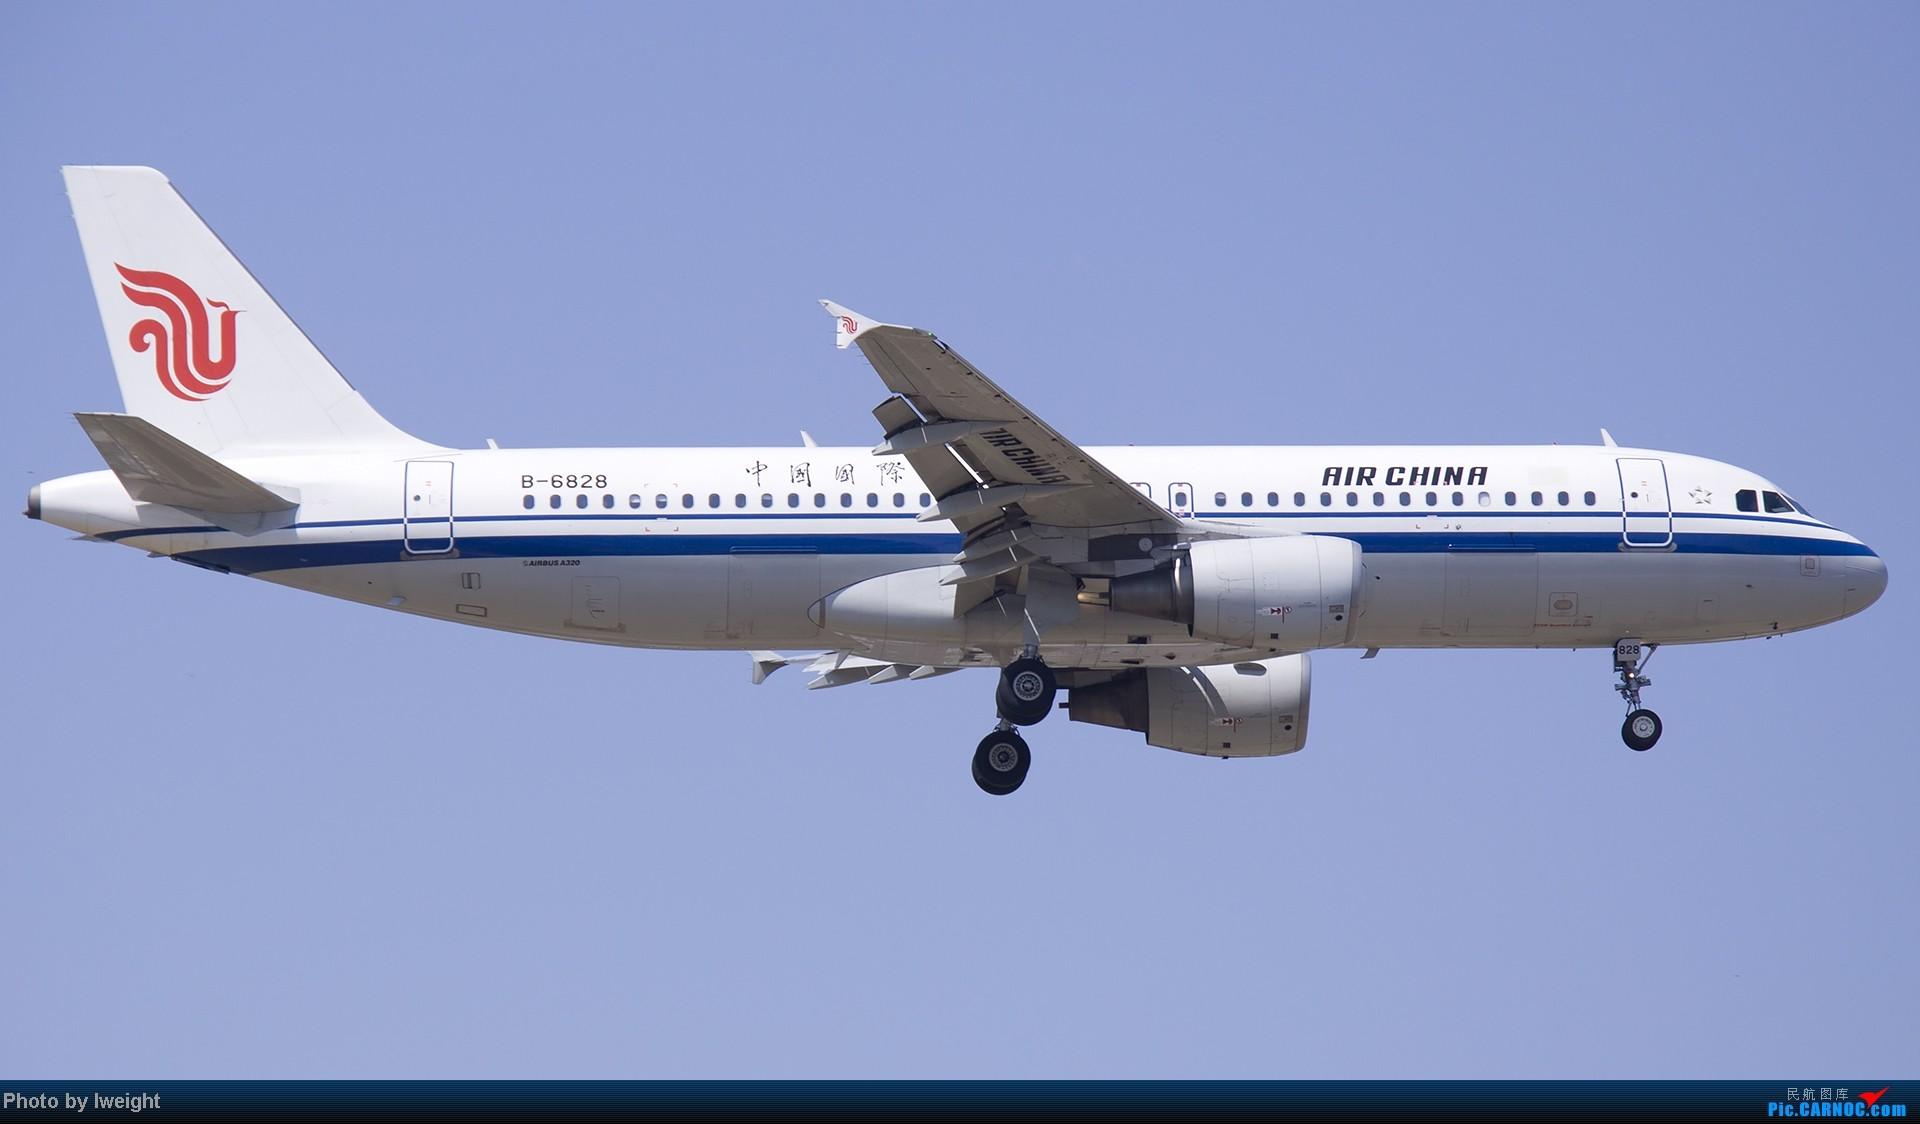 Re:[原创]北京难得的好天气,收获多种机型和彩绘,遗憾的是再次错过卡航巴塞罗那彩绘 AIRBUS A320-200 B-6828 中国北京首都机场